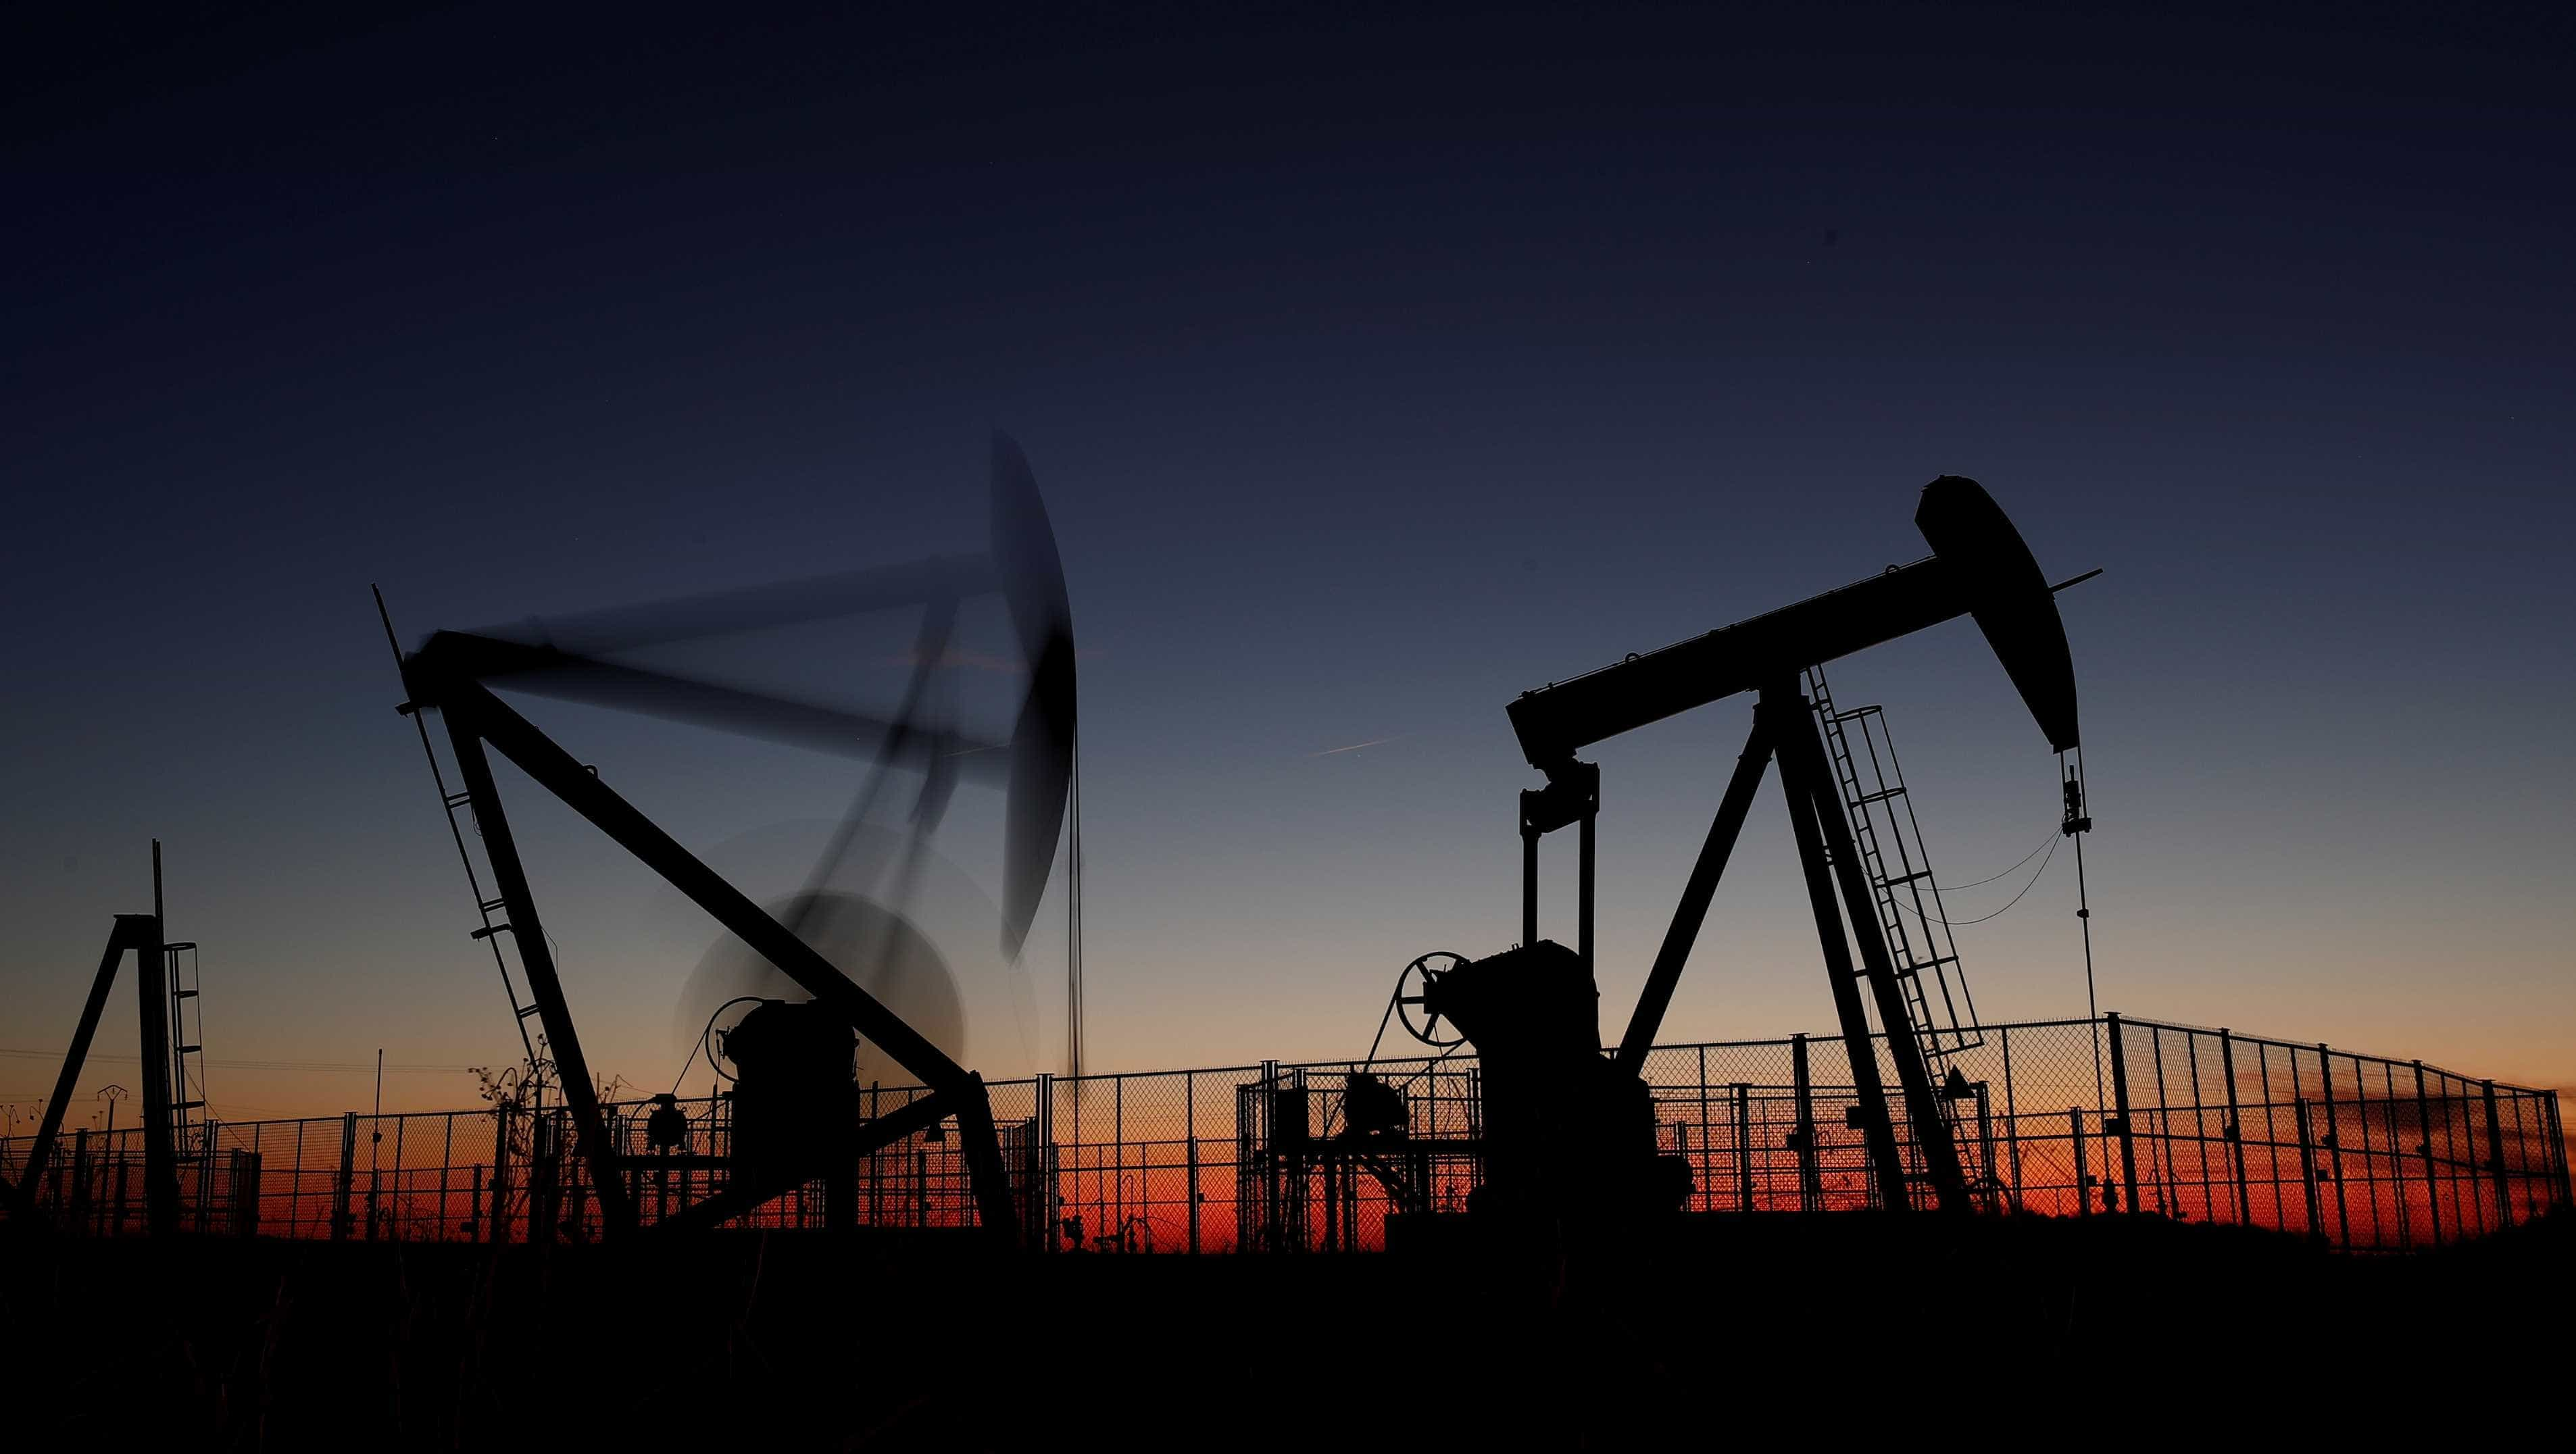 Opep planeja cortar produção de petróleo em 1 mi de barris